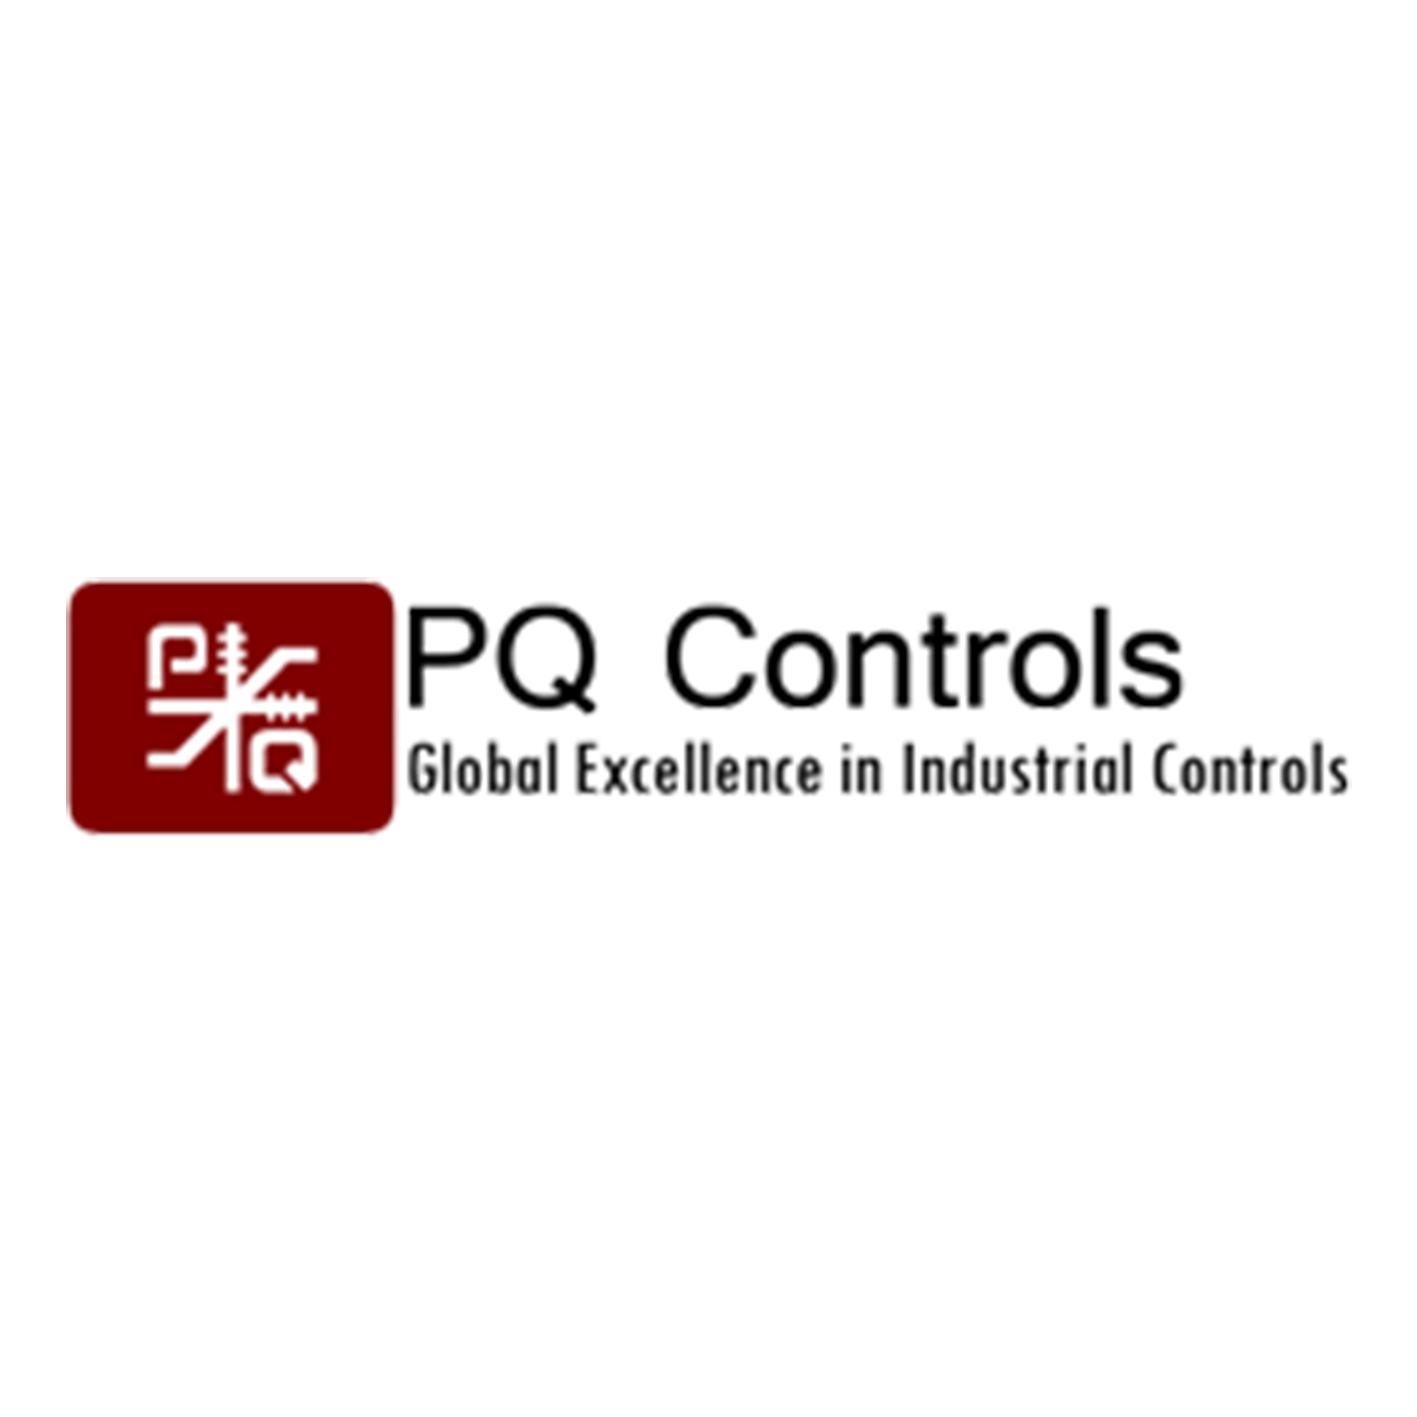 PQ Controls